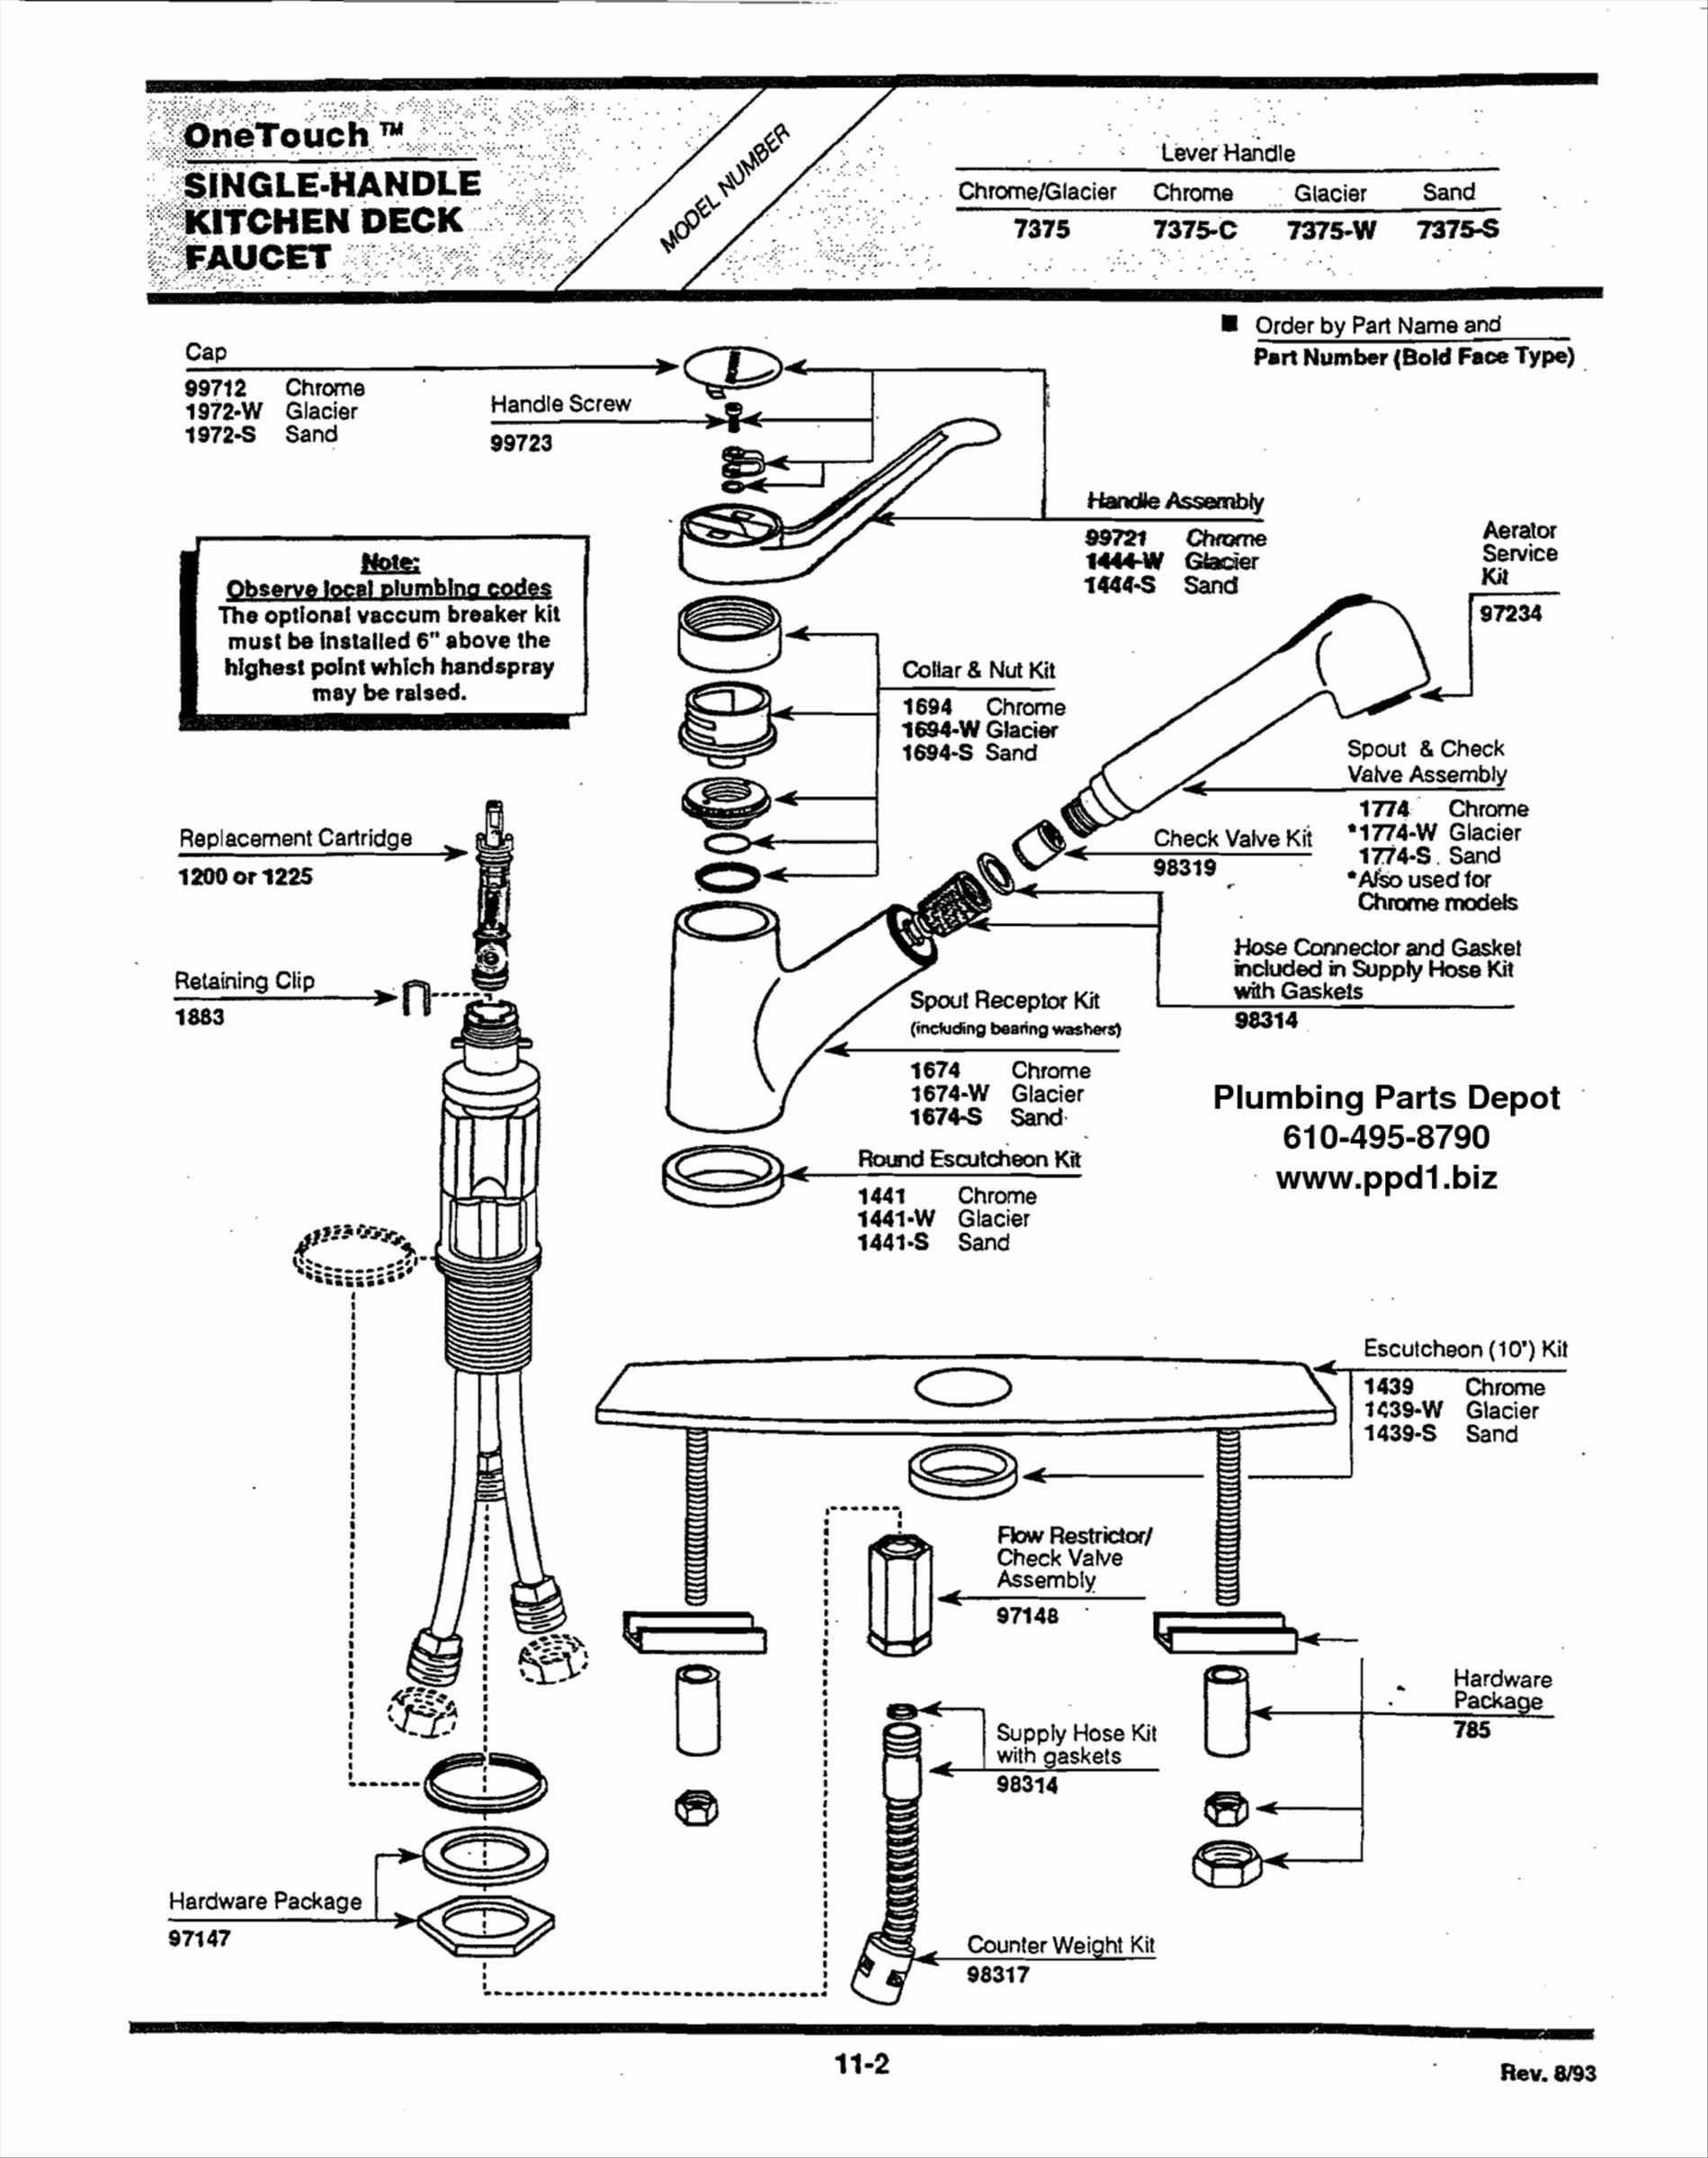 American Standard Kitchen Faucet Parts Diagram Beautiful Moen Bathroom Faucets Parts 50 S Of American Standard Kitchen Faucet Parts Diagram